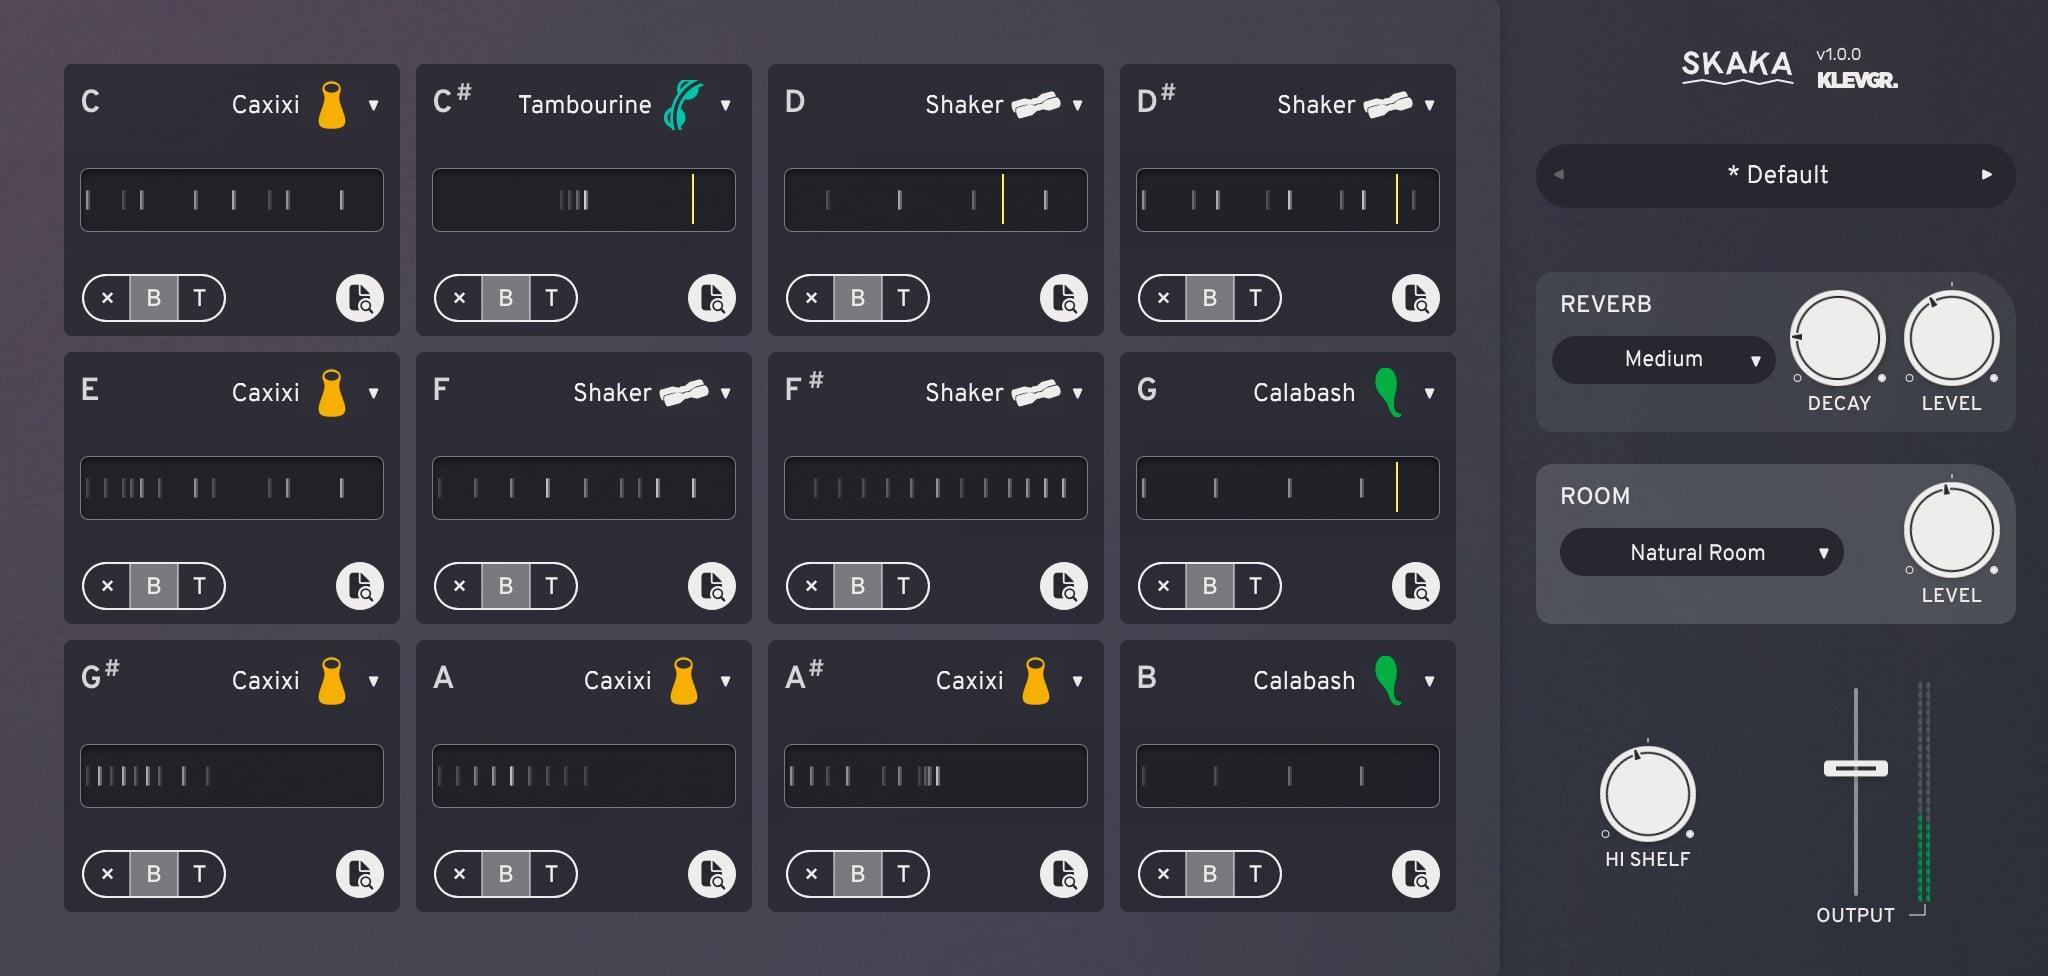 Klevgrand Skaka 1.0.0 WIN OSX Mac 破解版 振动筛打击乐器